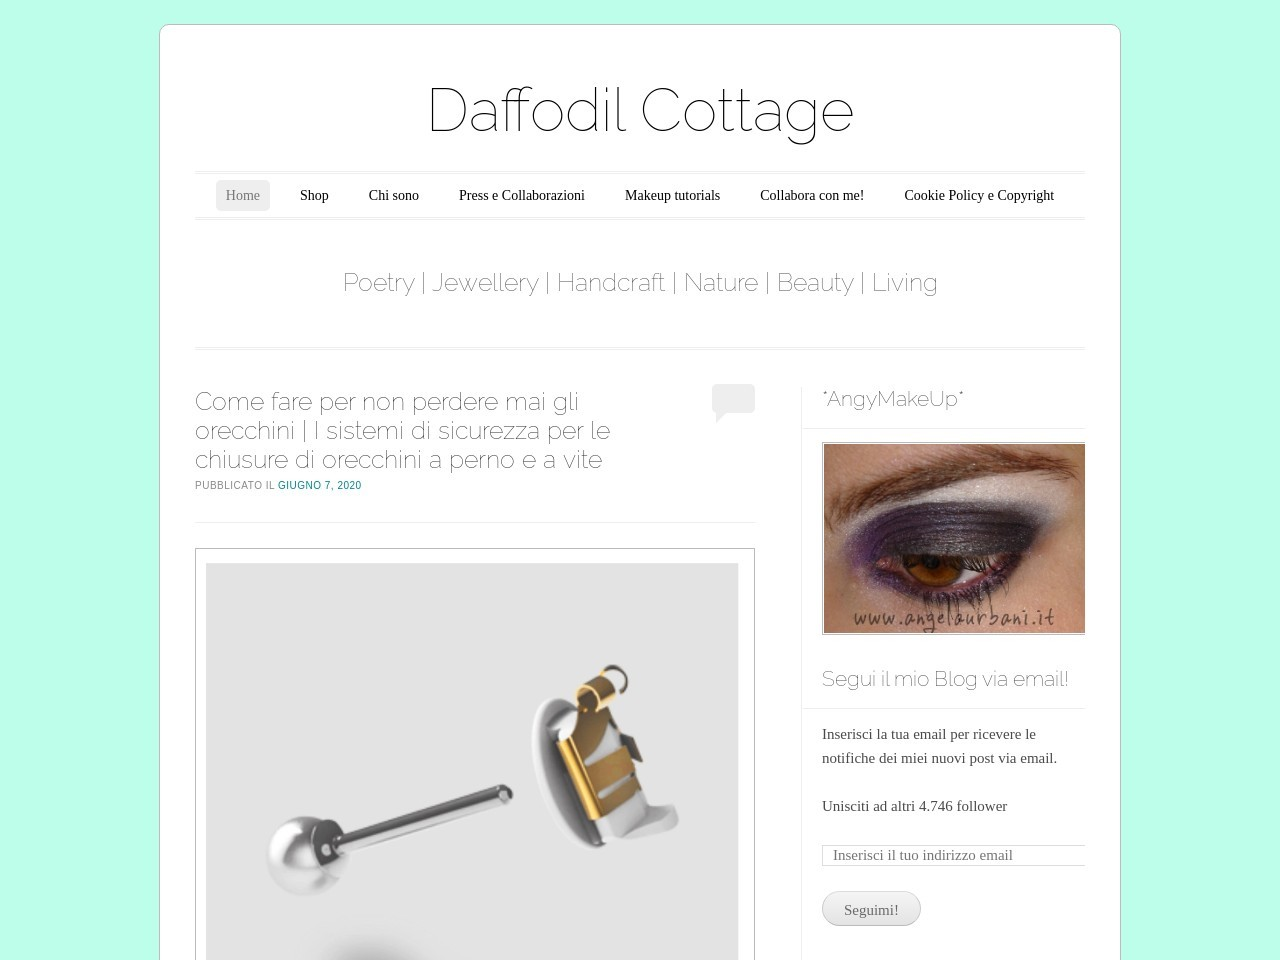 daffodil-cottage